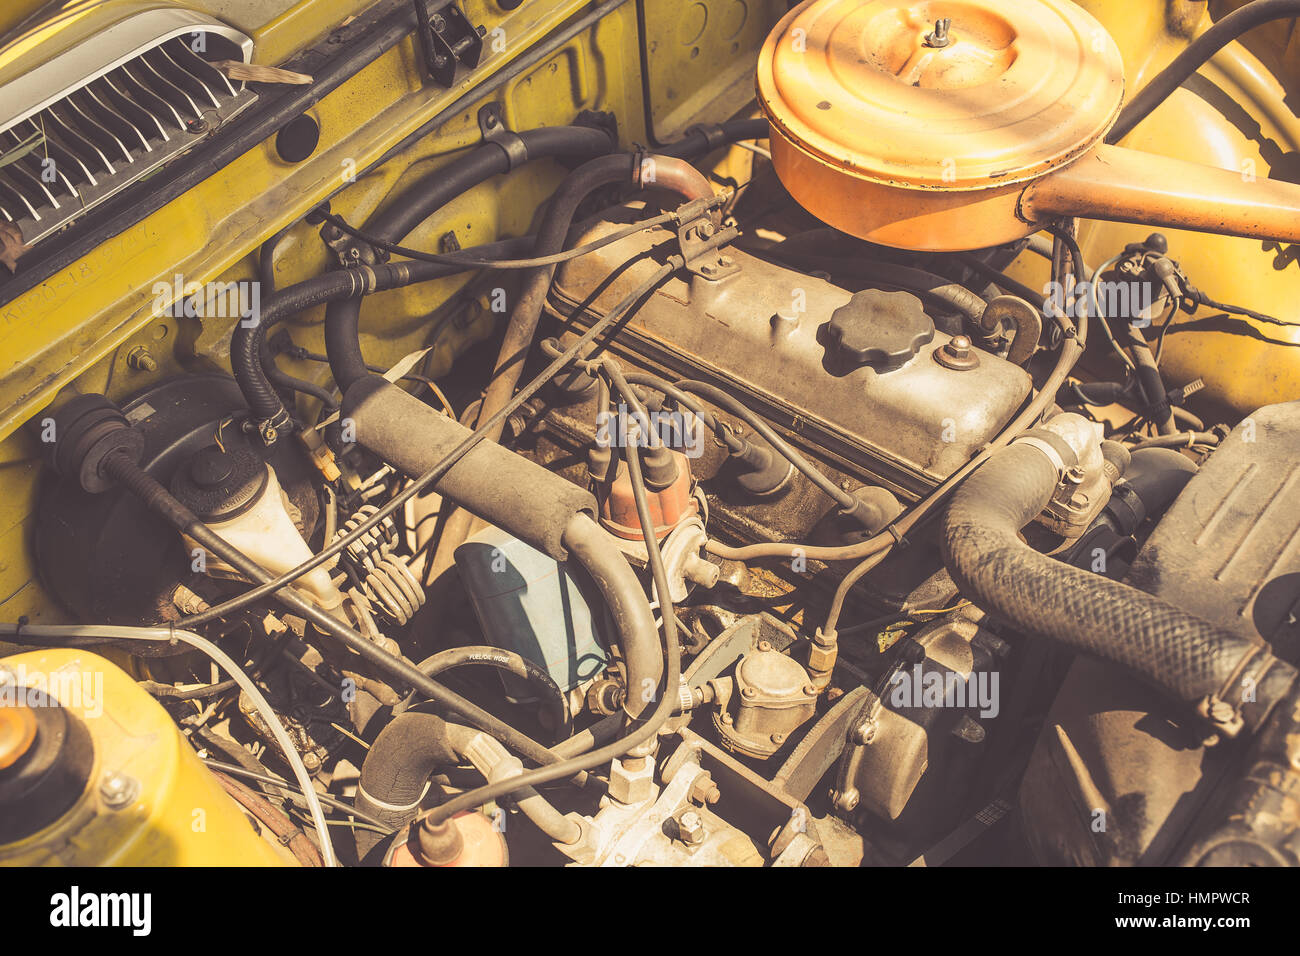 old car engine vintage color tone Stock Photo: 133268599 - Alamy